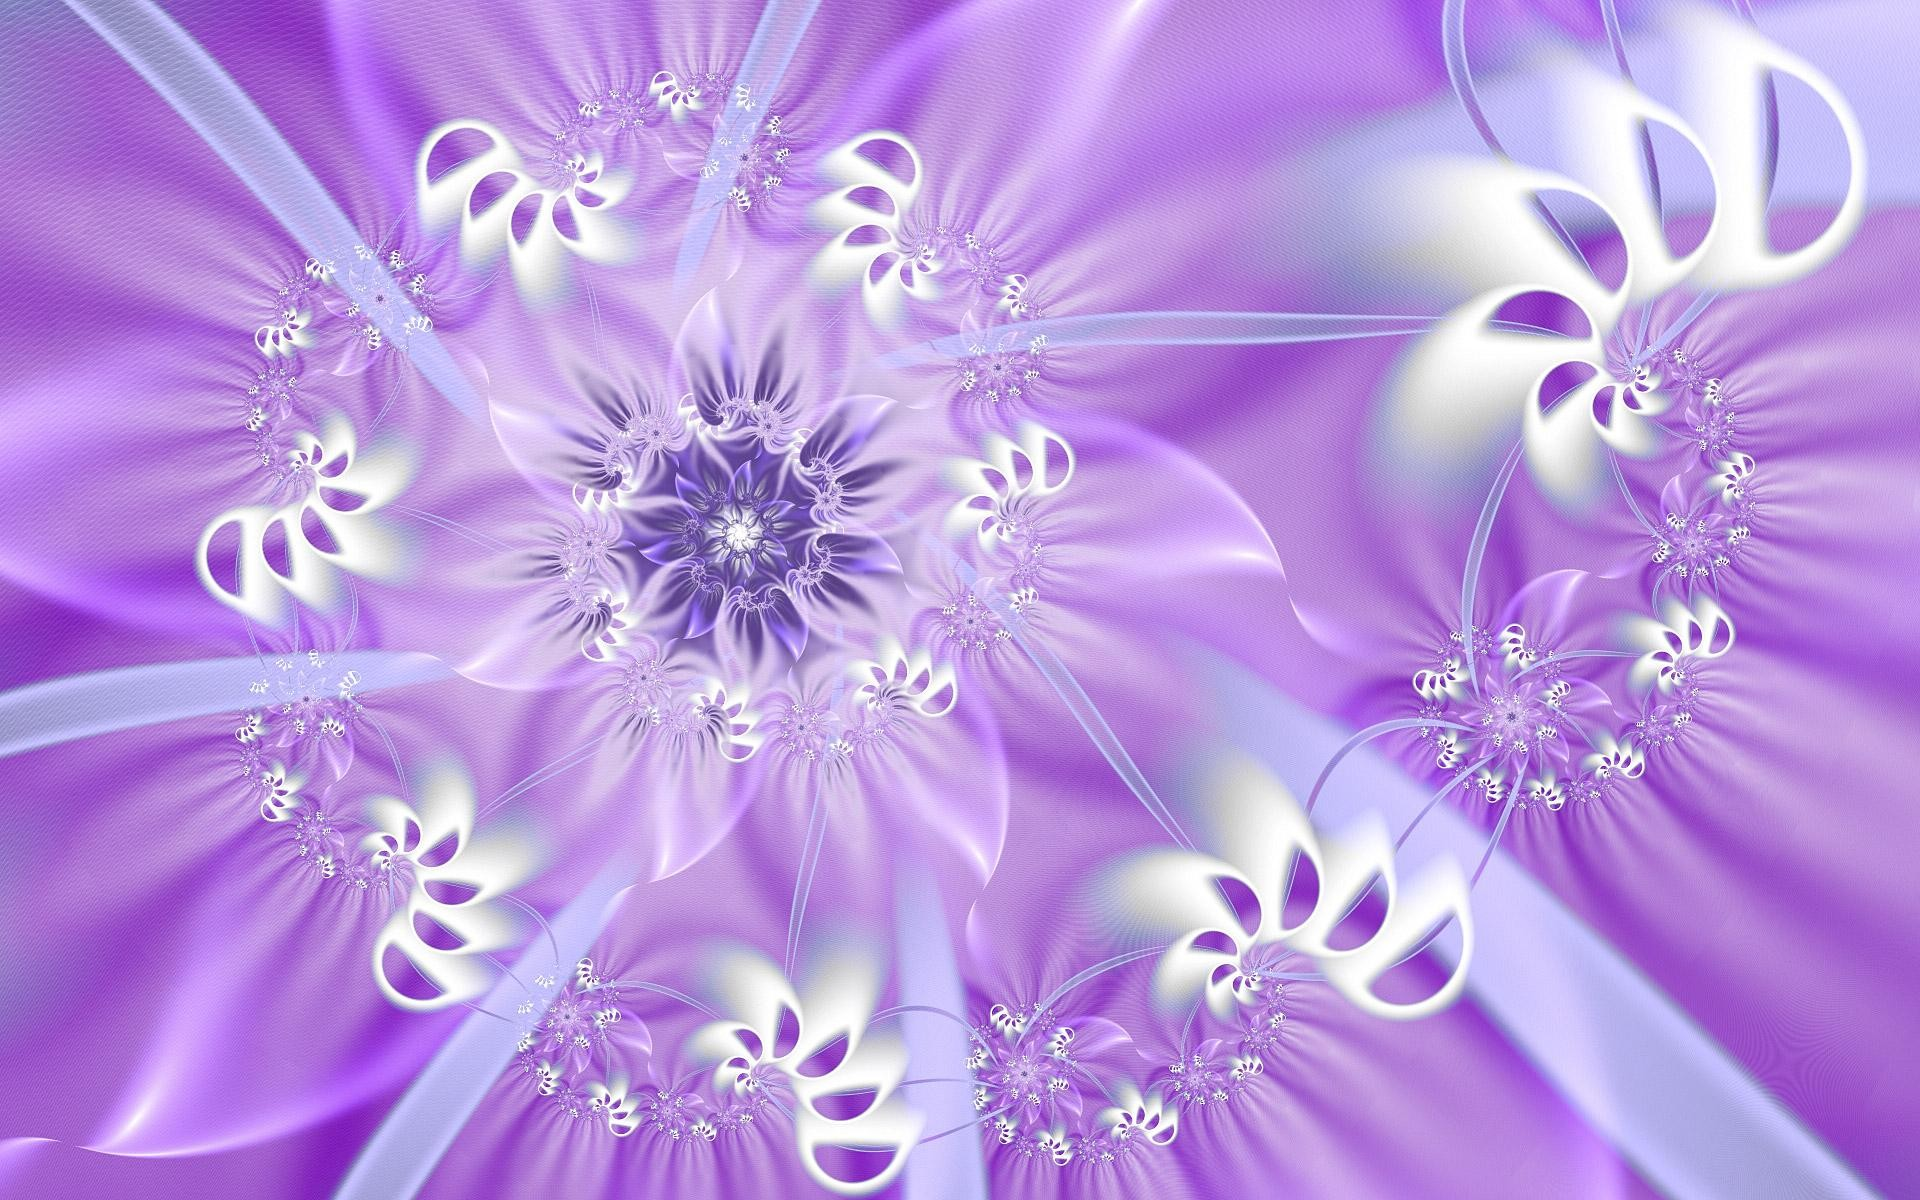 violet swirl wallpaper 8335